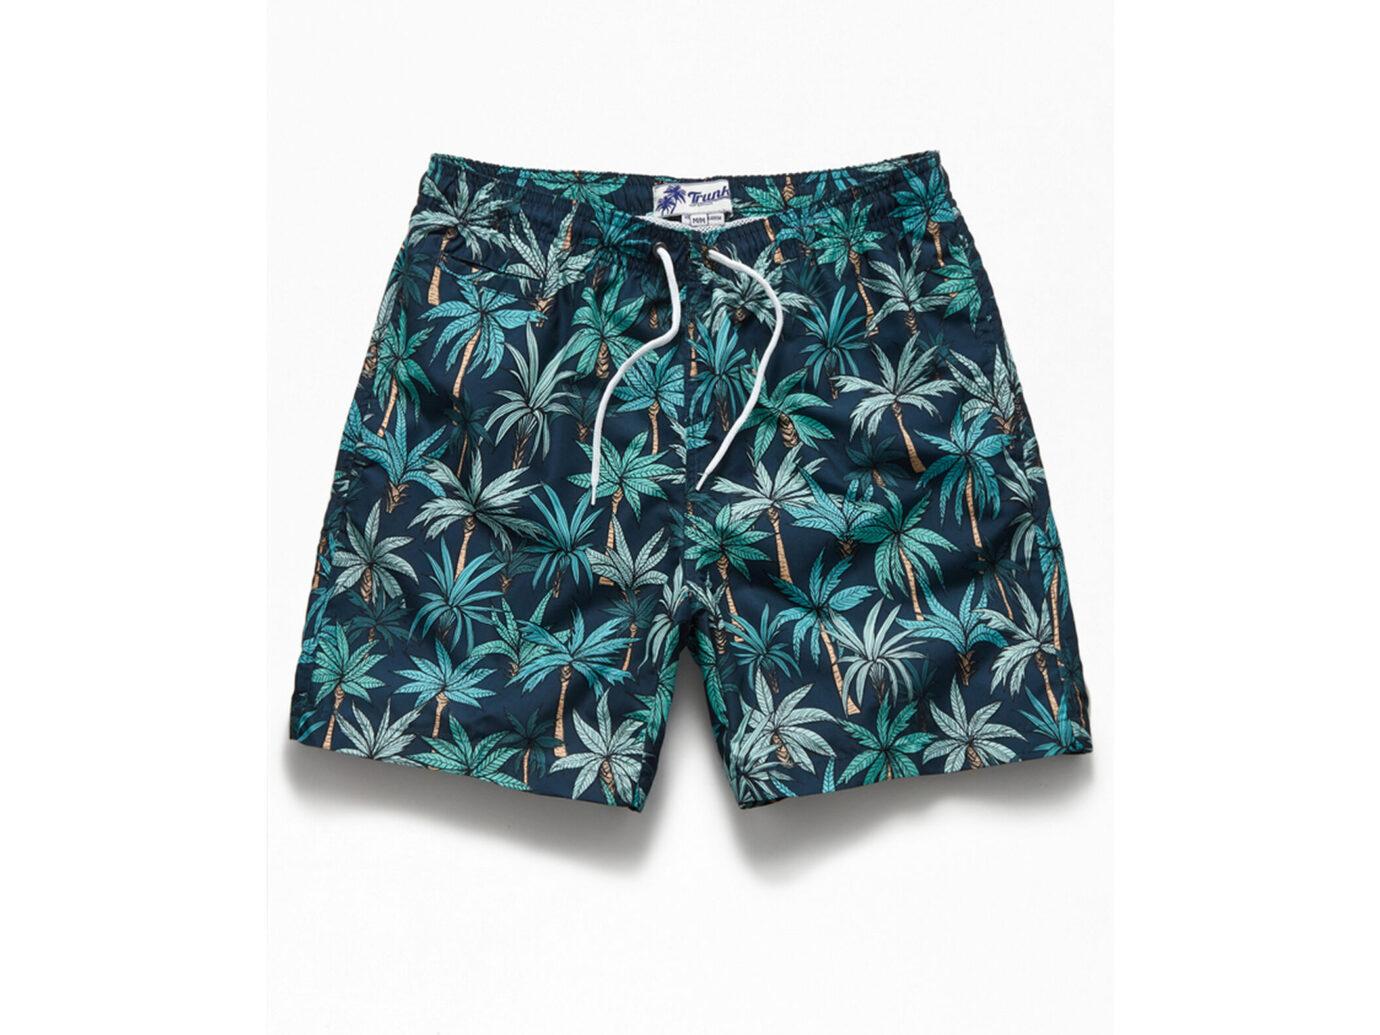 Trunks Surf & Swim Jungle Palm Trees Swim Trunks